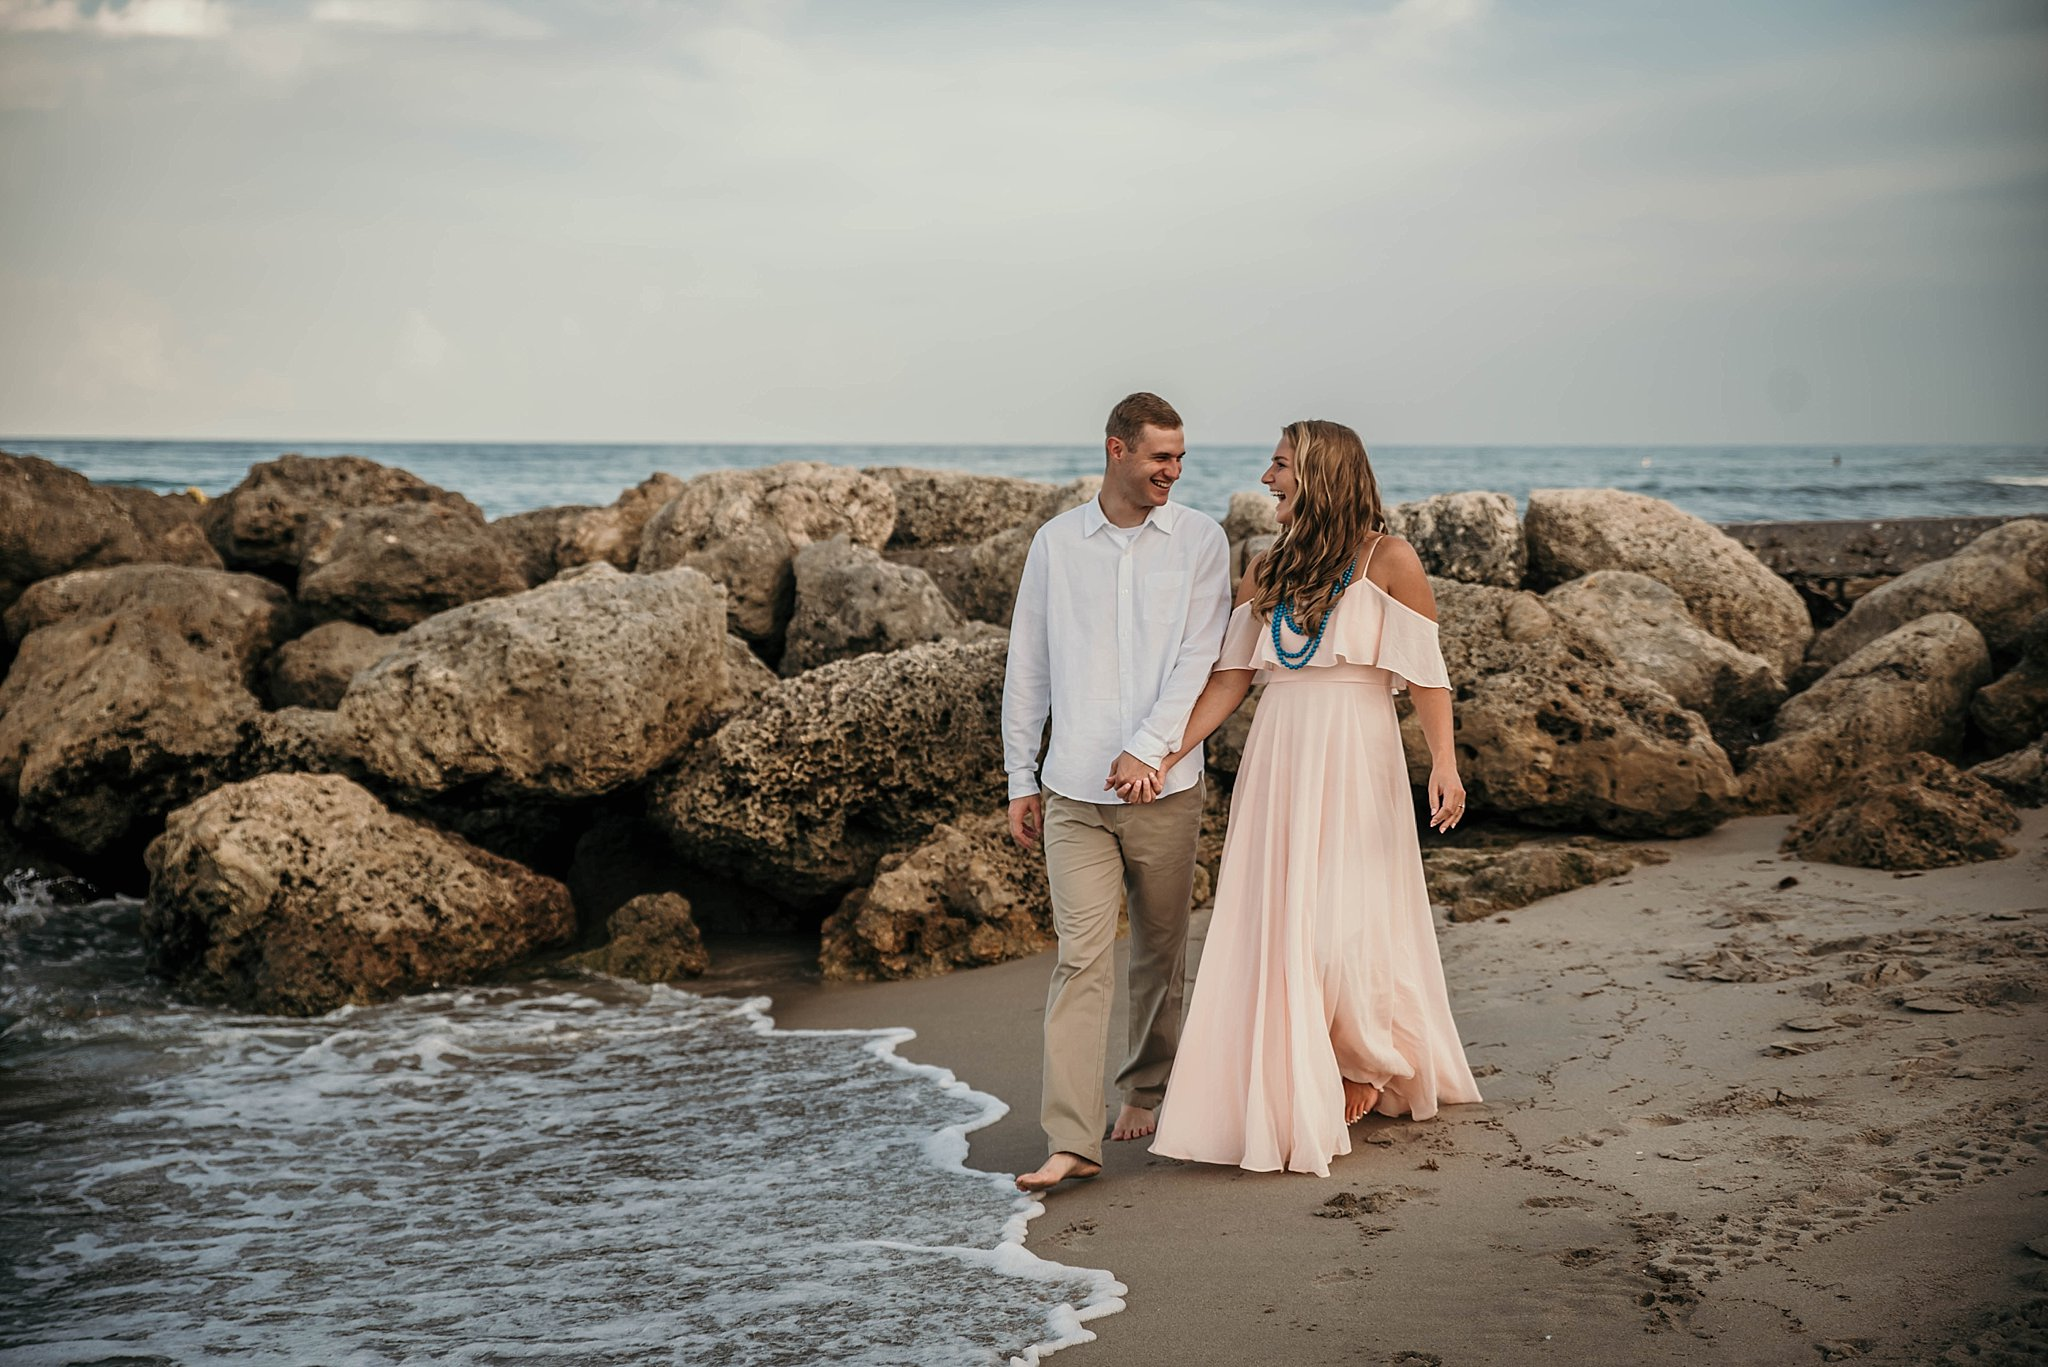 palm-beach-engagement-photos-florida-wedding-photographer_0014.jpg